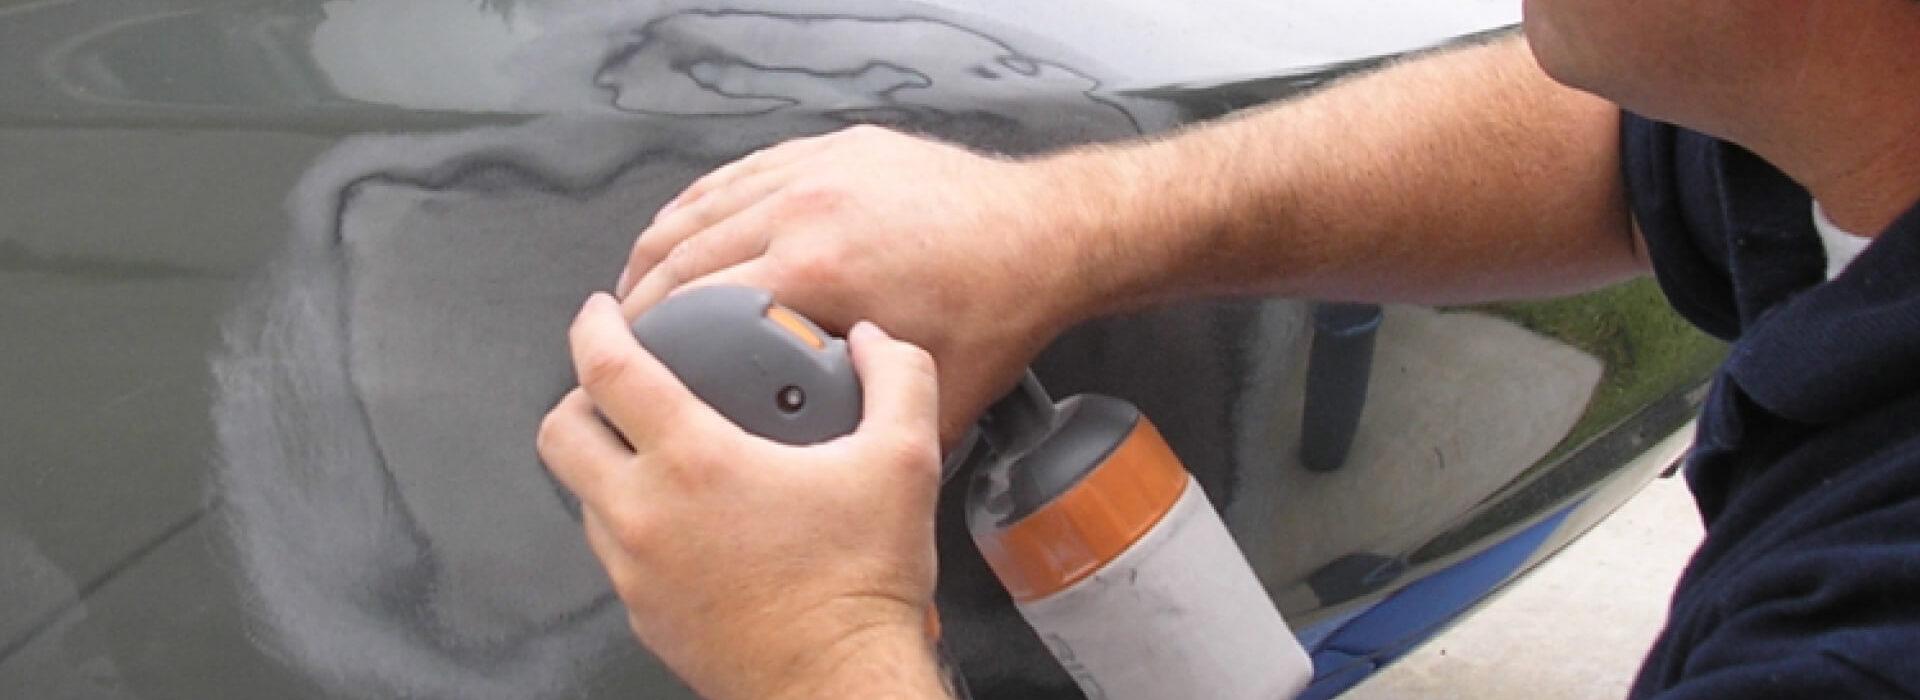 Dent repair Dublin | Smart CPR